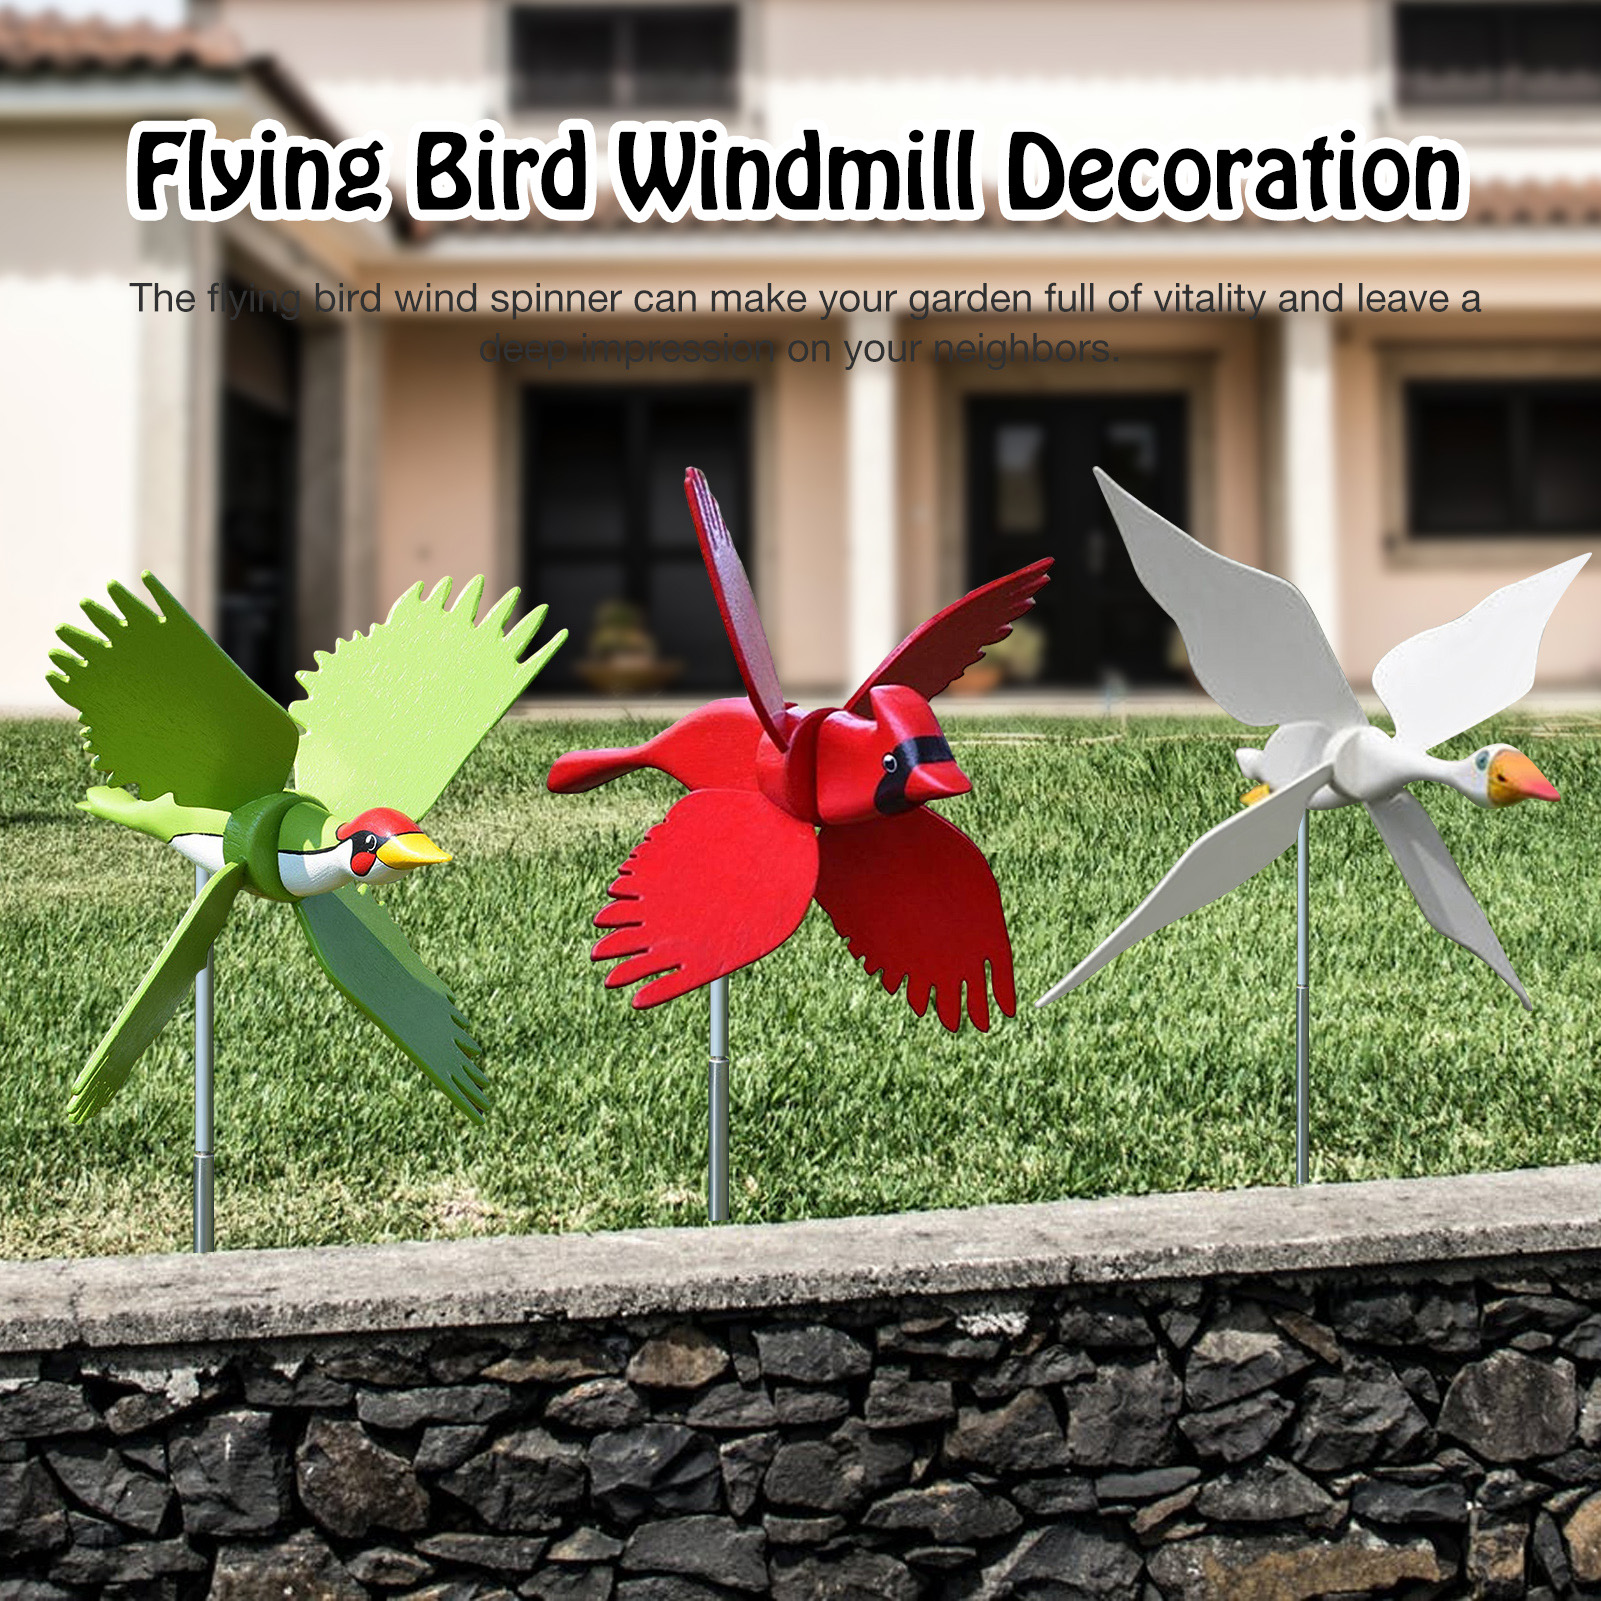 Windmill Whirligig Asuka Series Resin Crafts Windmill Garden Lawn Yard Decor Wind Spinner Flying Bird Ornament Housewarming Gift